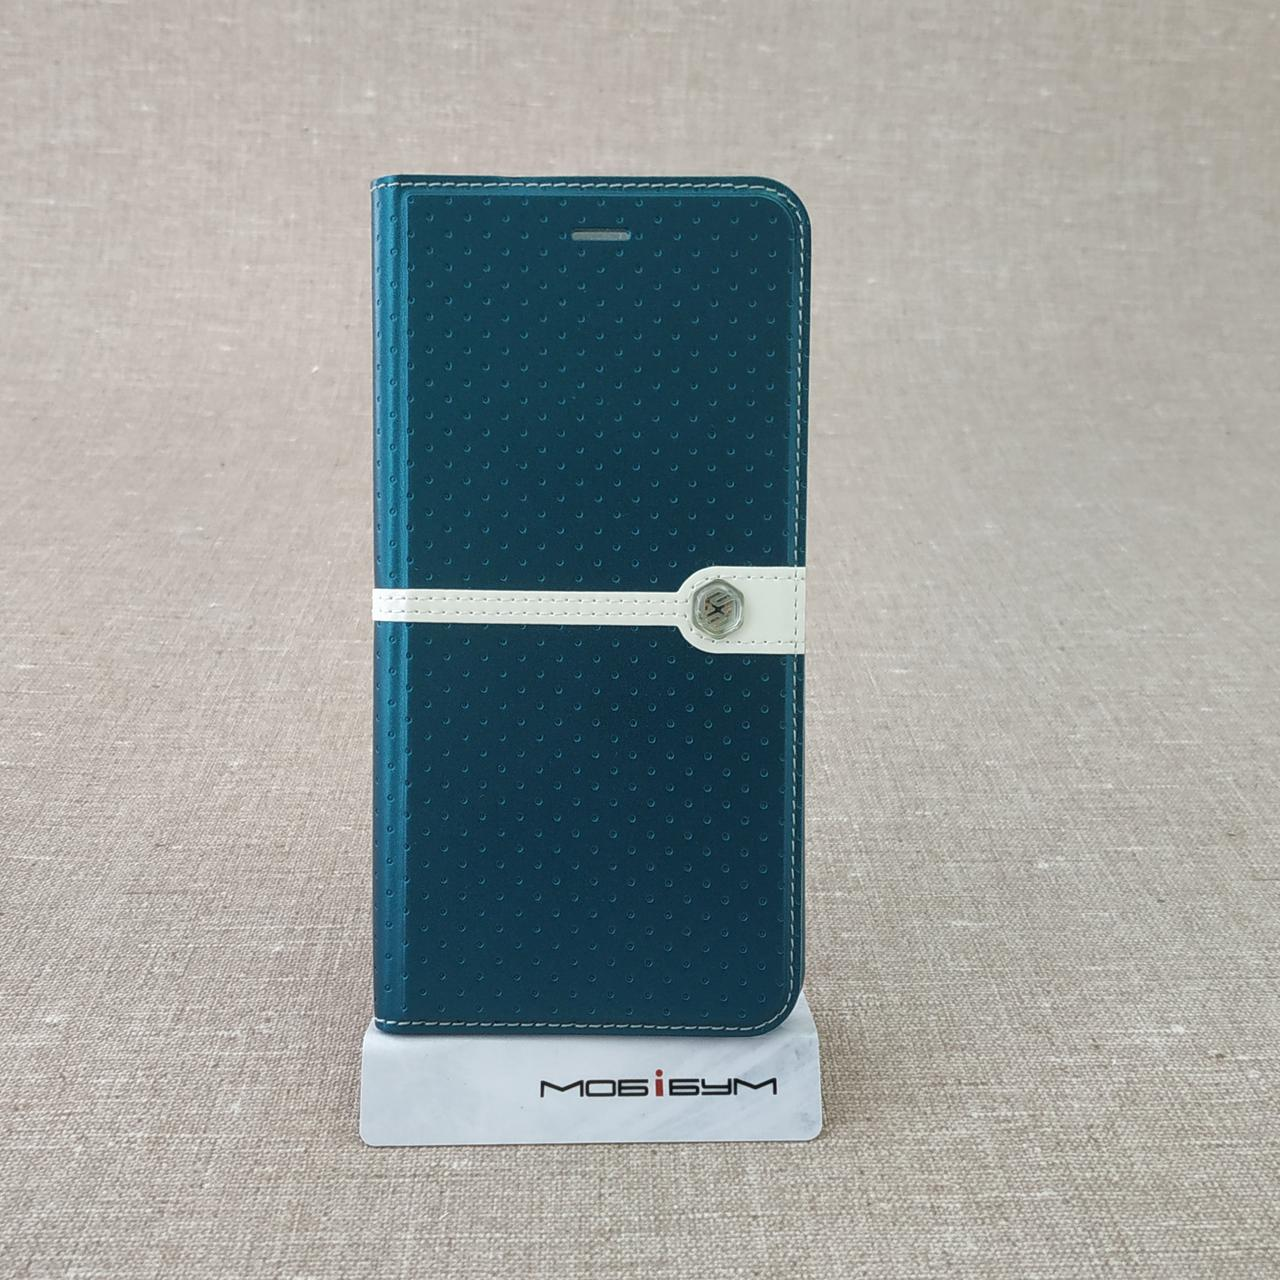 Чехол Nillkin Ice iPhone 6 Plus turquoise EAN/UPC: 6956473204343